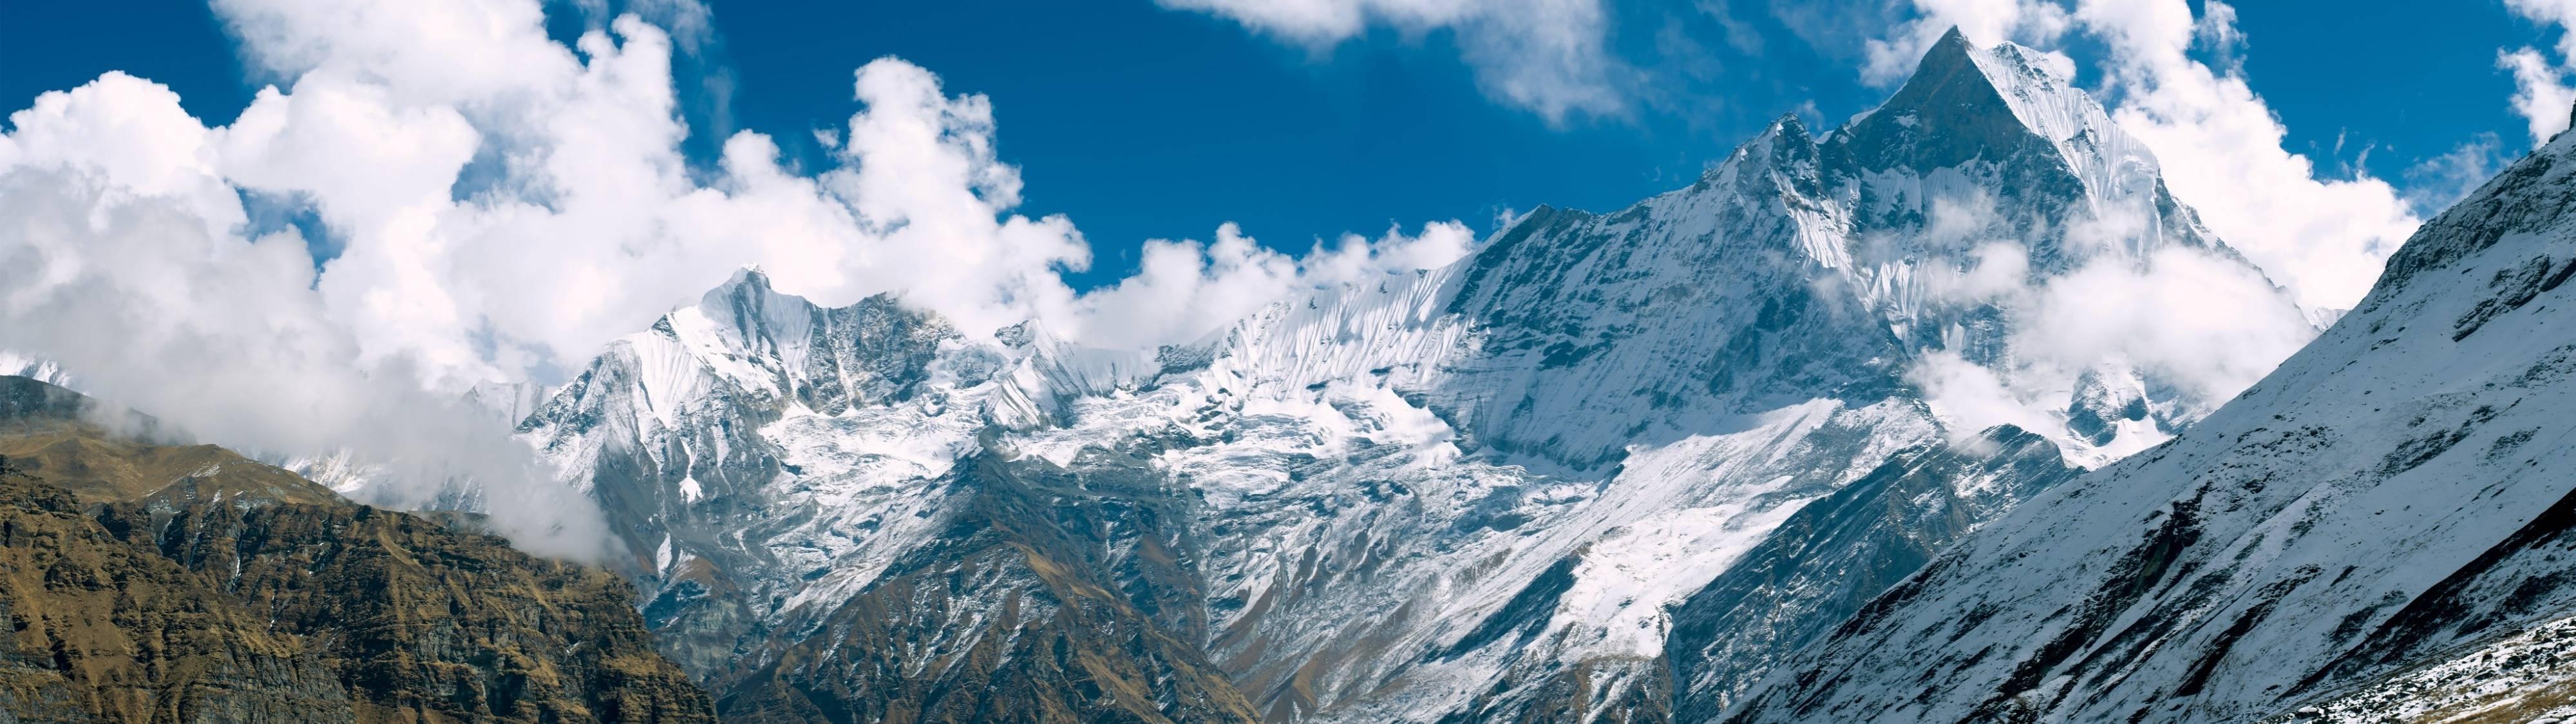 Reiseplaner Backpacking Nepal